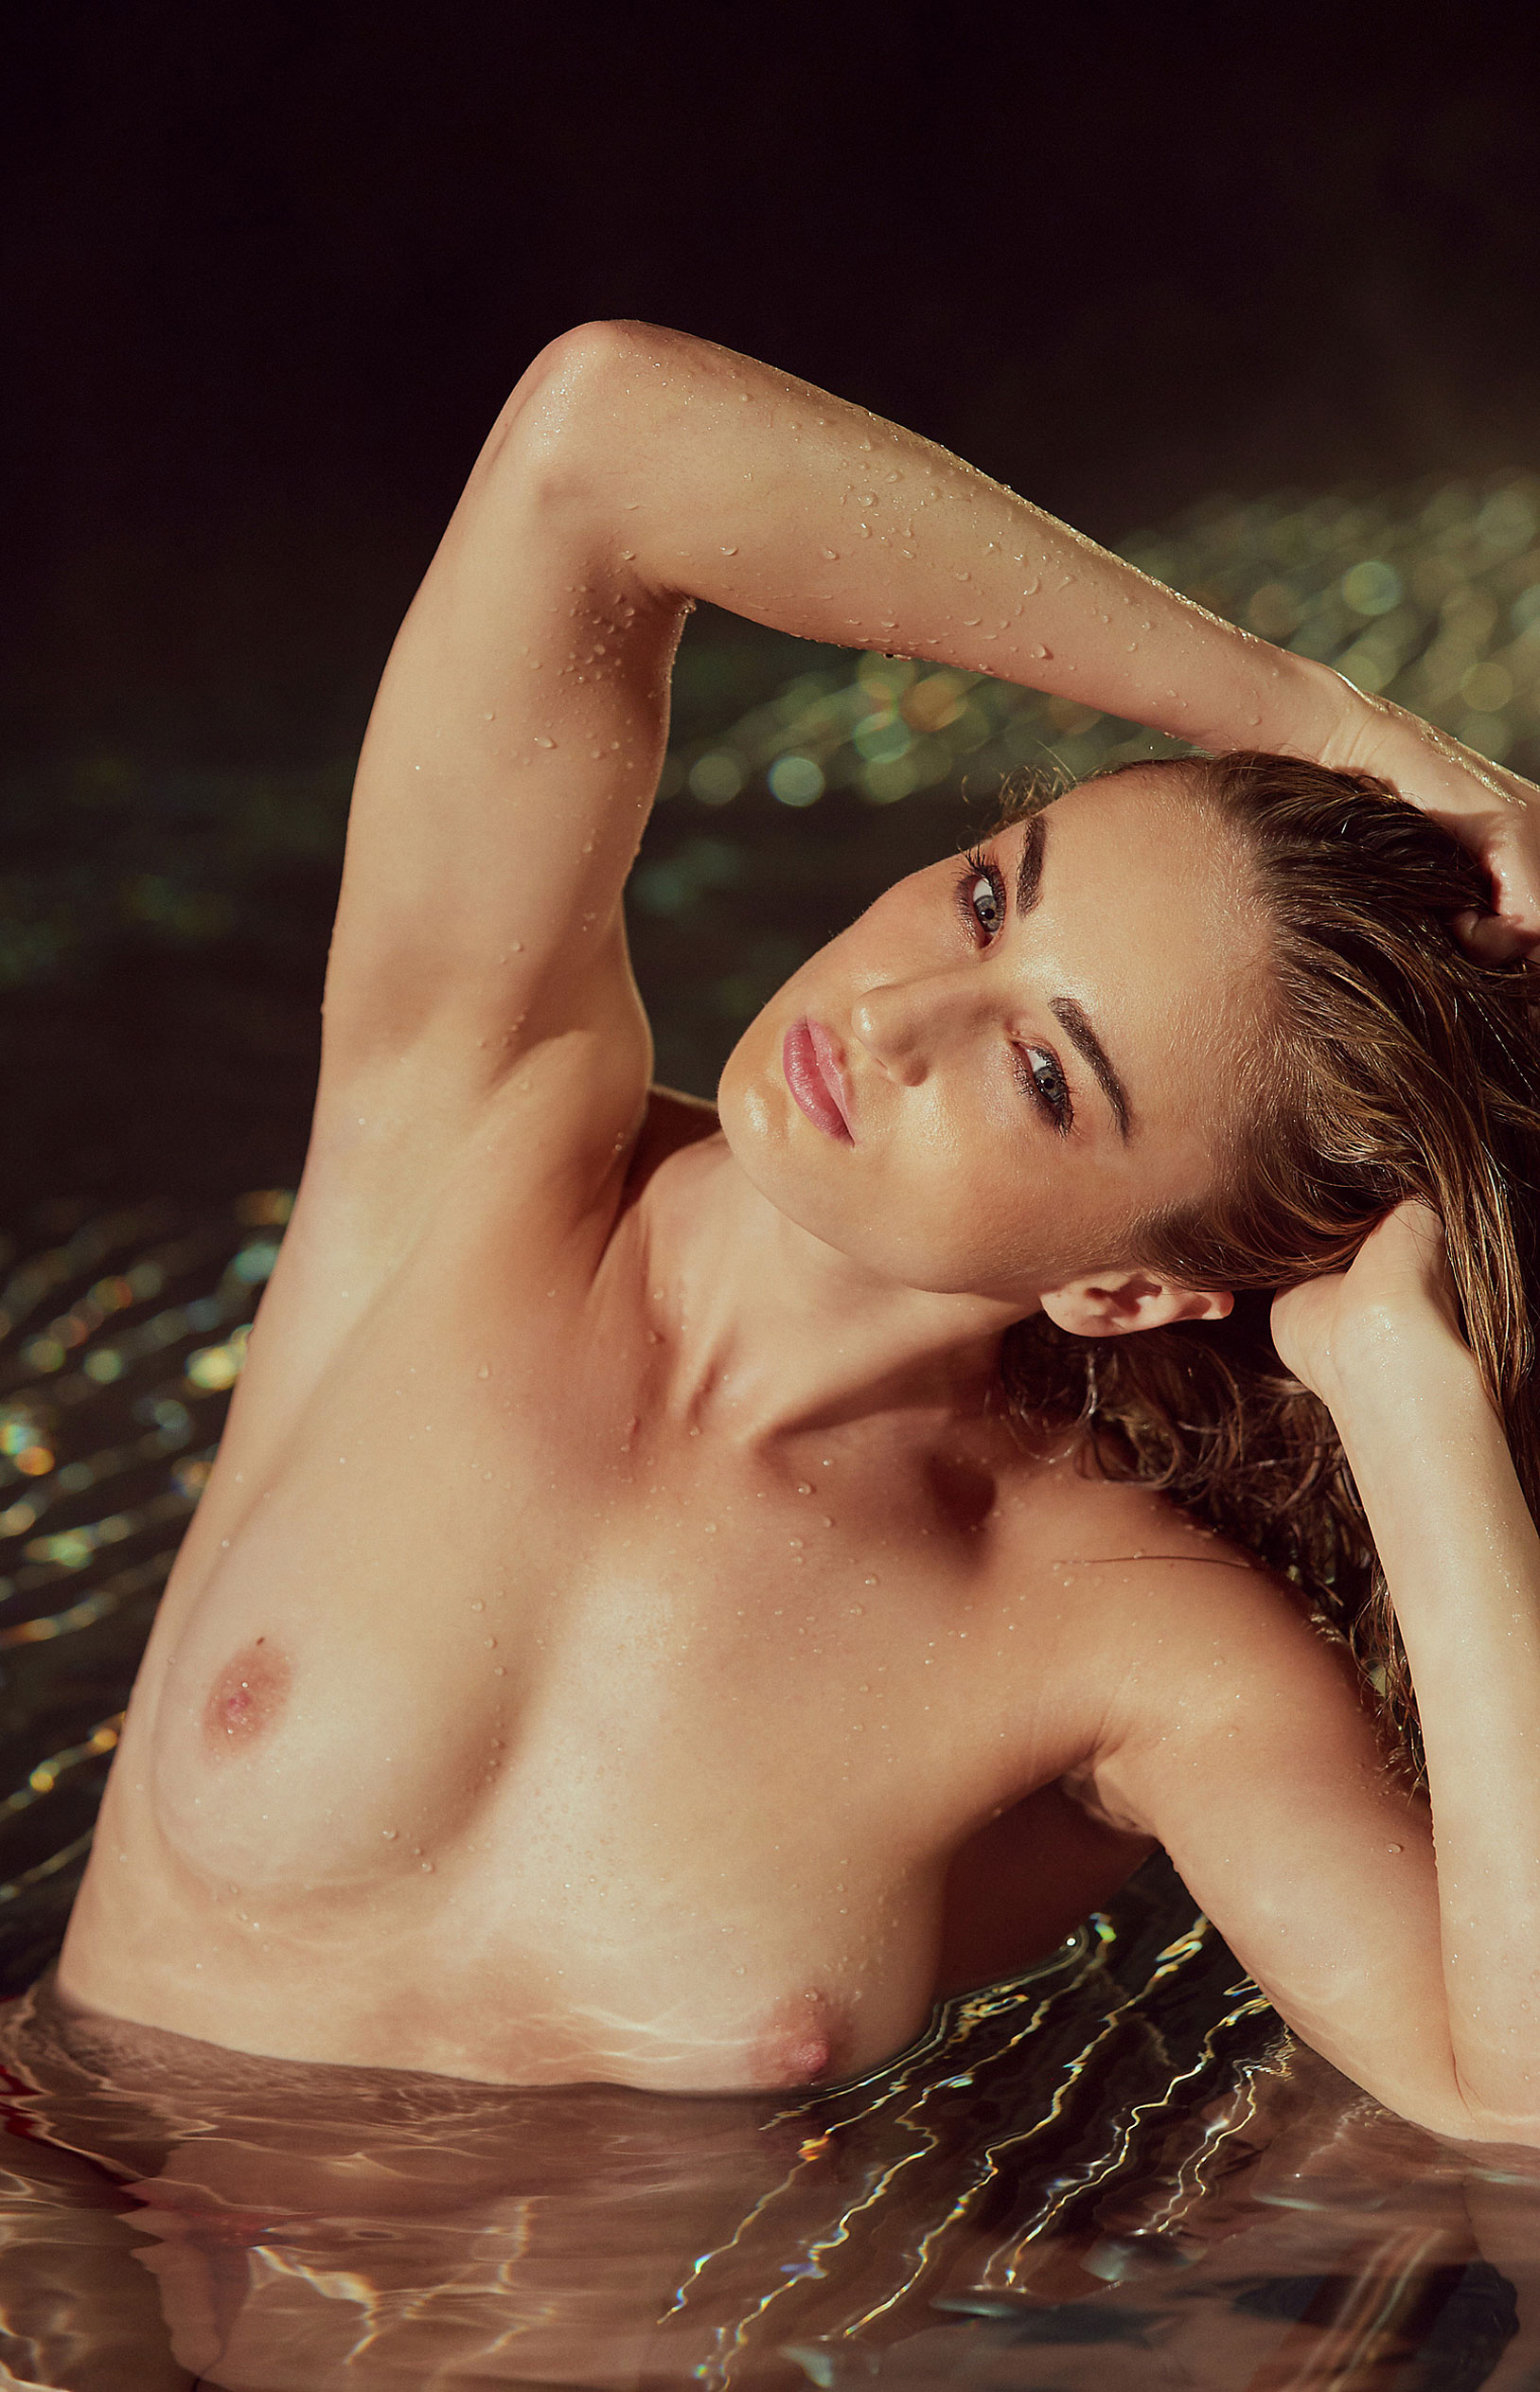 пловчиха Елена Кравцова в журнале Playboy Германия, октябрь 2020 / фото 21